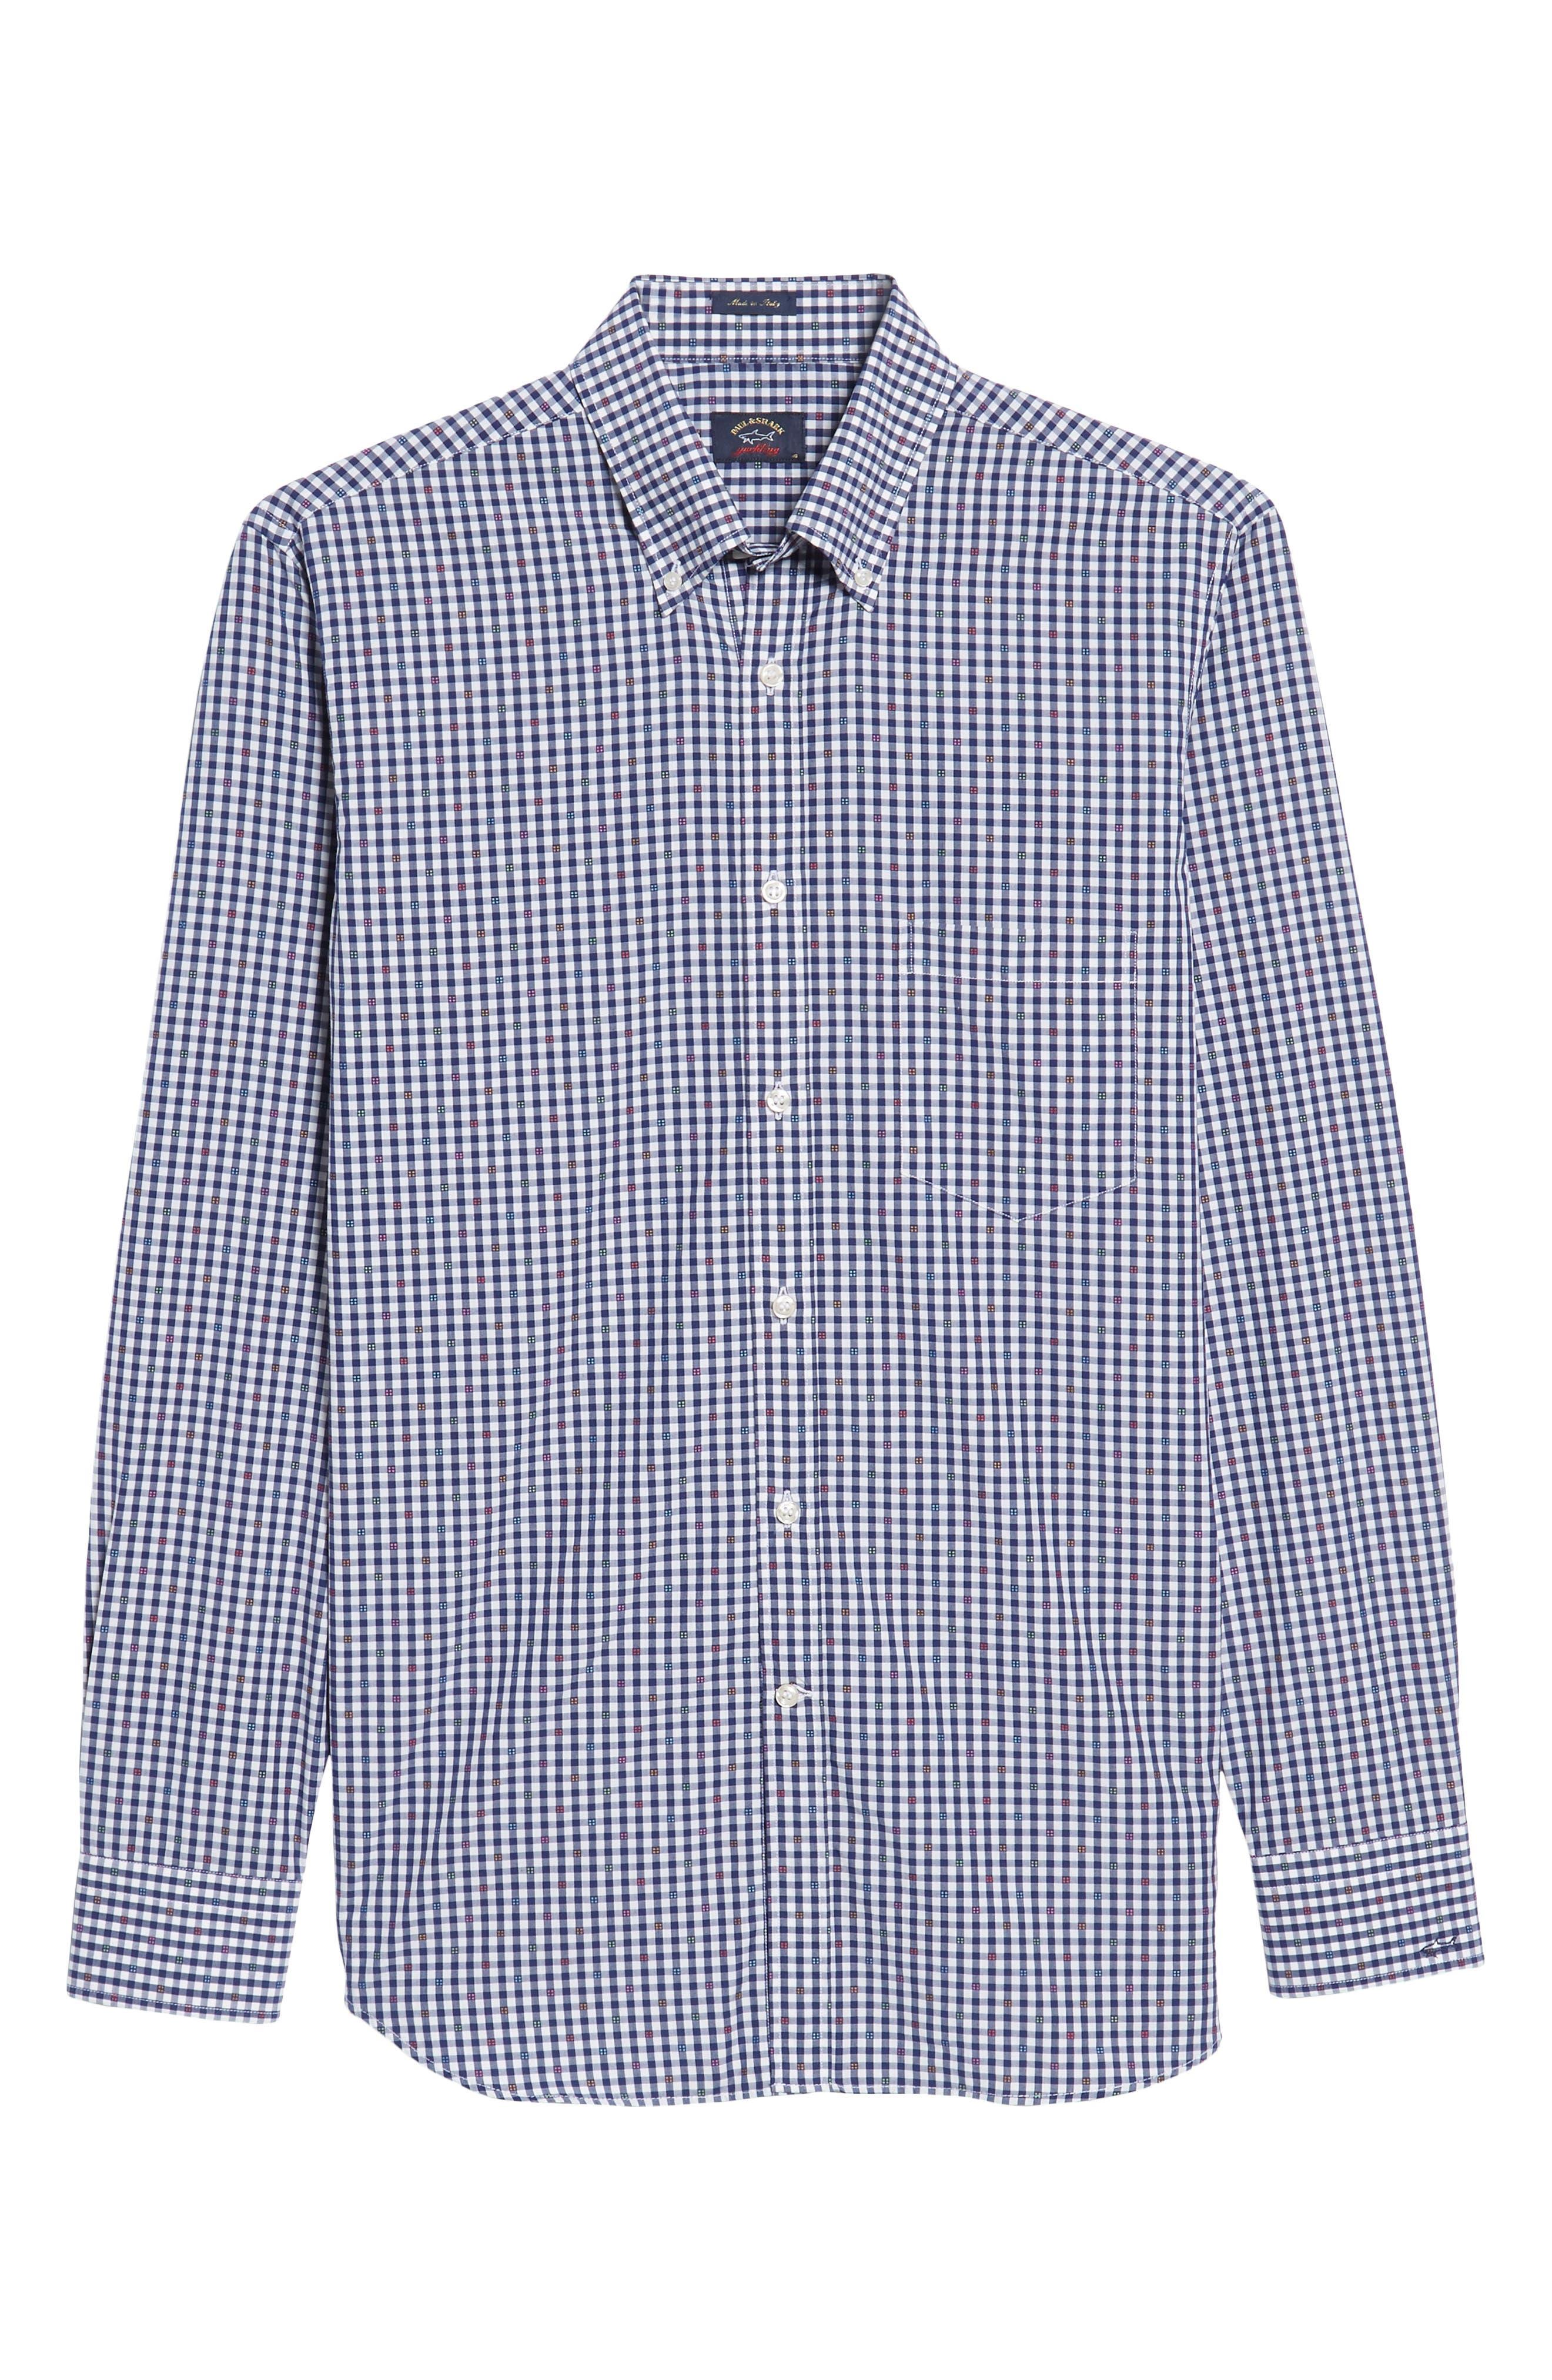 Paul&Shark Regular Fit Jacquard Check Sport Shirt,                             Alternate thumbnail 6, color,                             Navy/ White